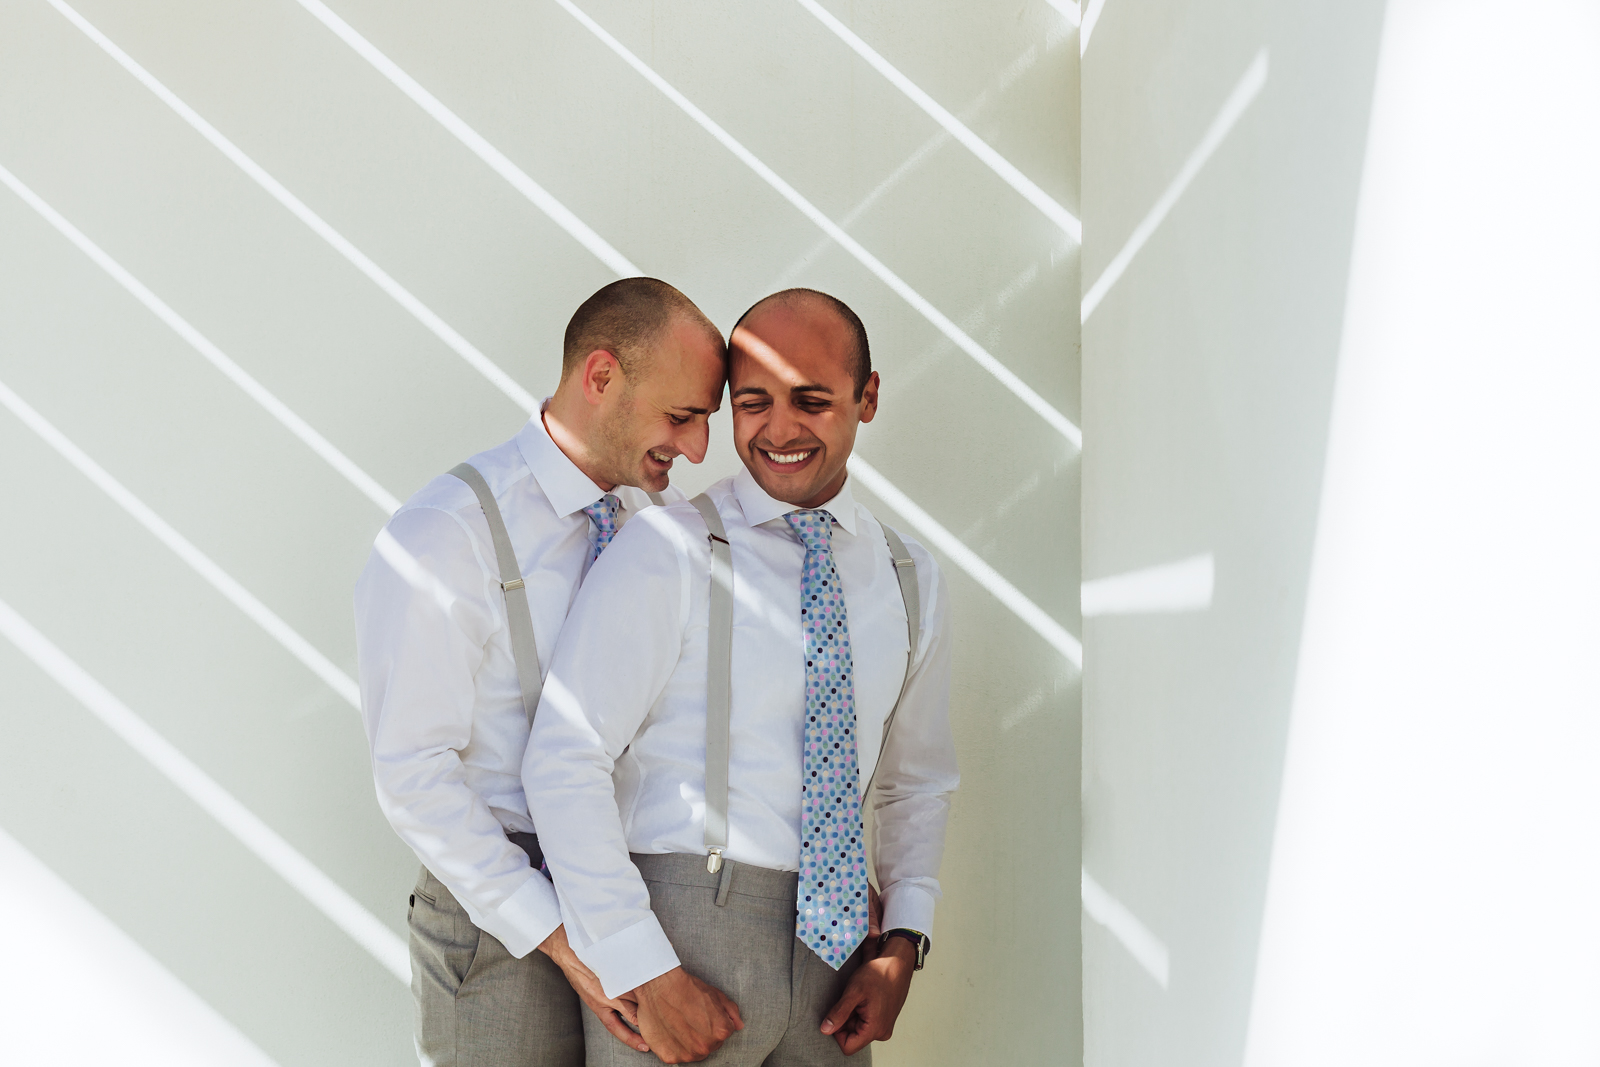 wedding-gay-hug-light-vallarta-hilton-hotel-smile-love